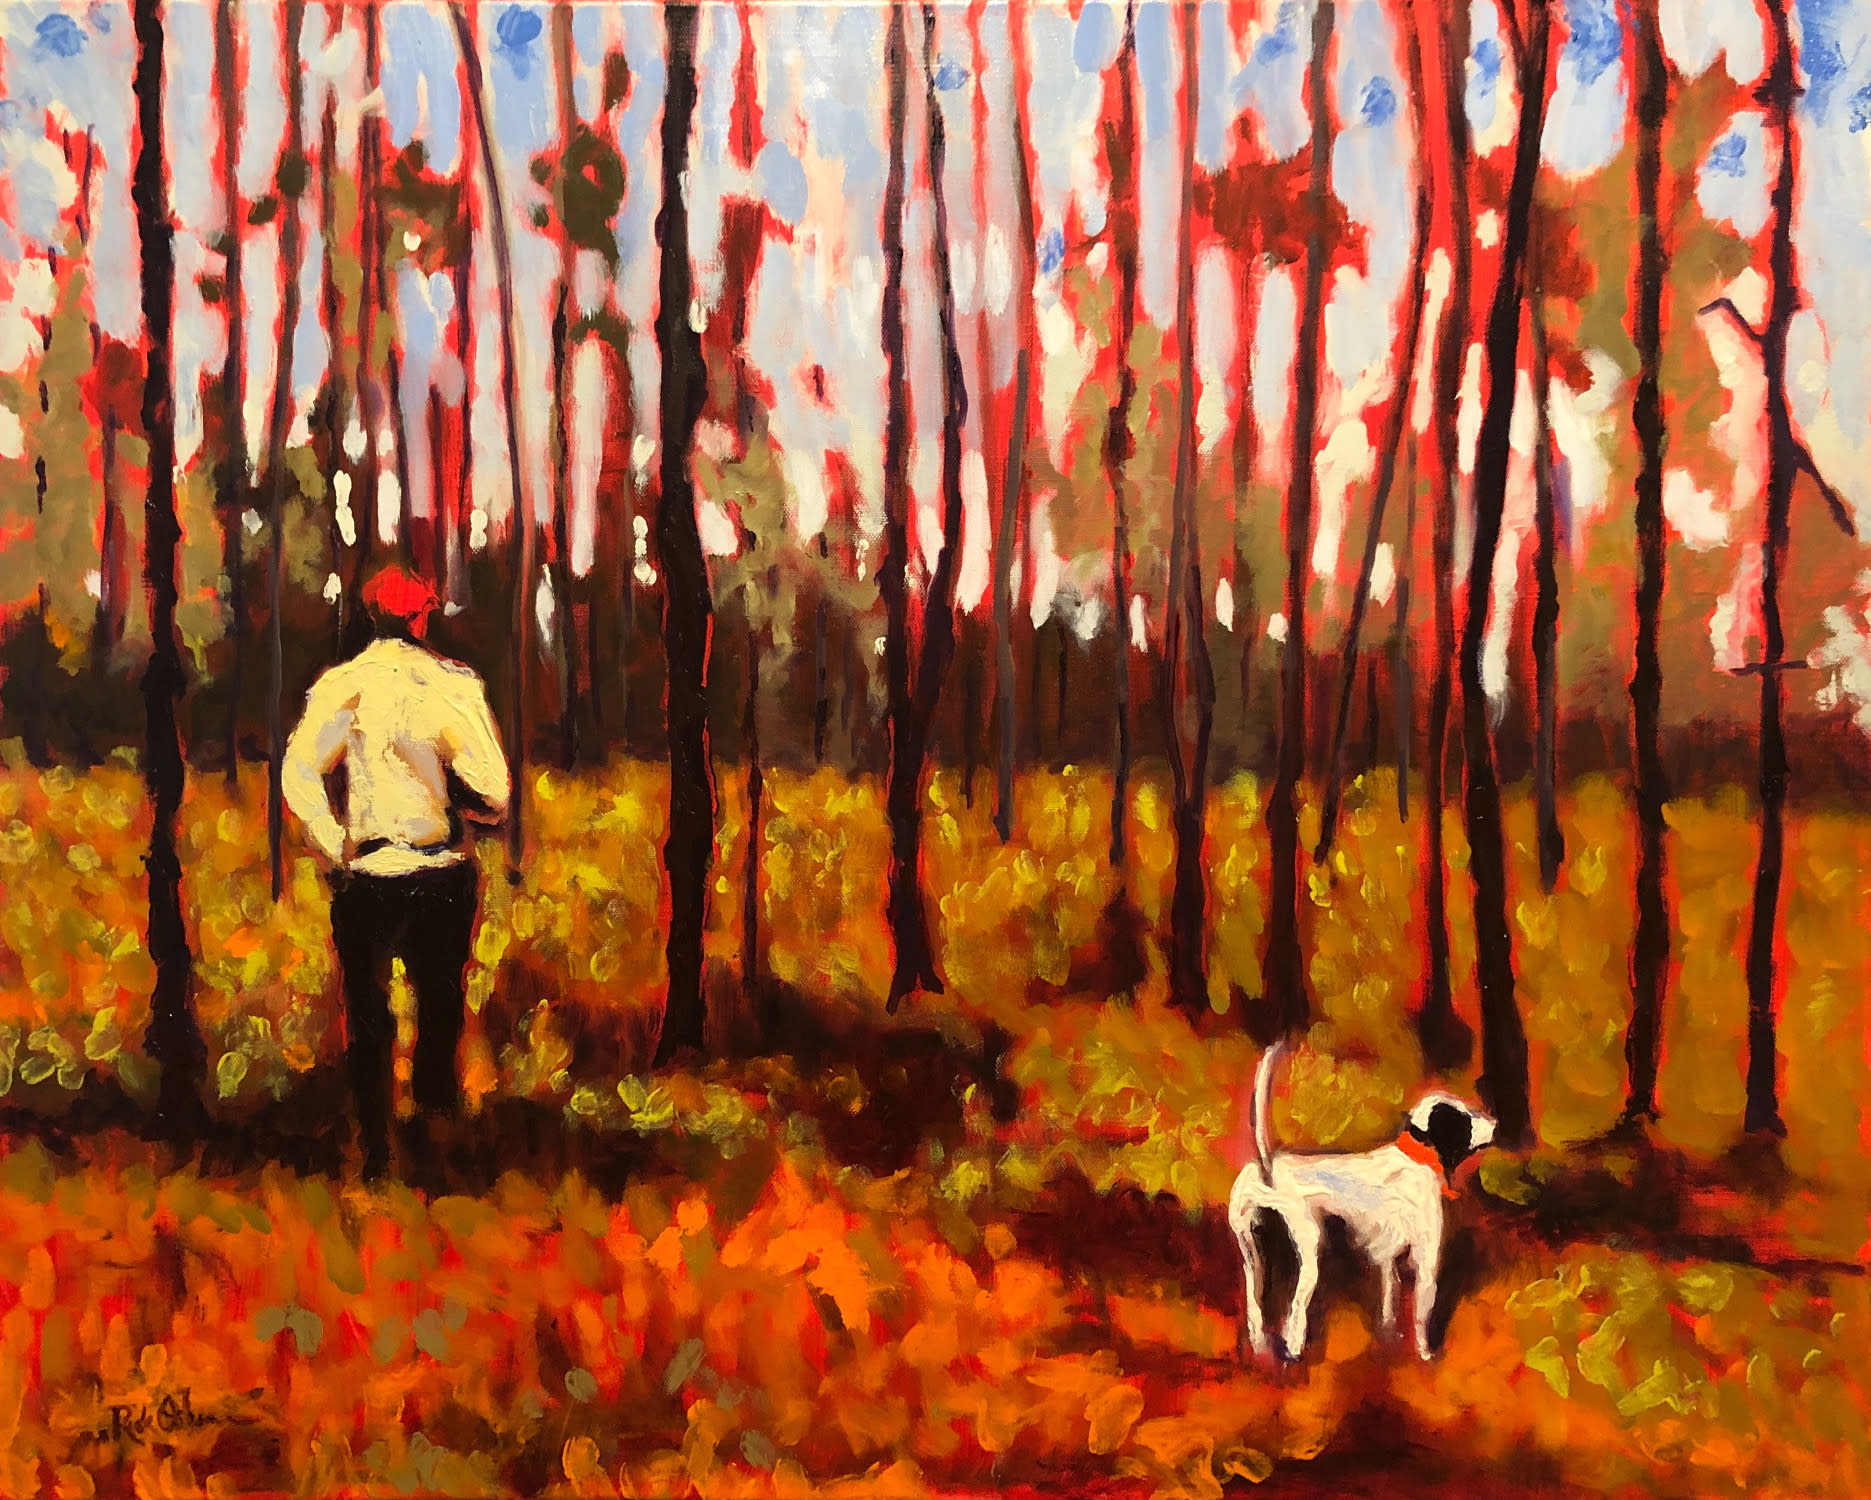 Man and hunting dog sm kwgmxq